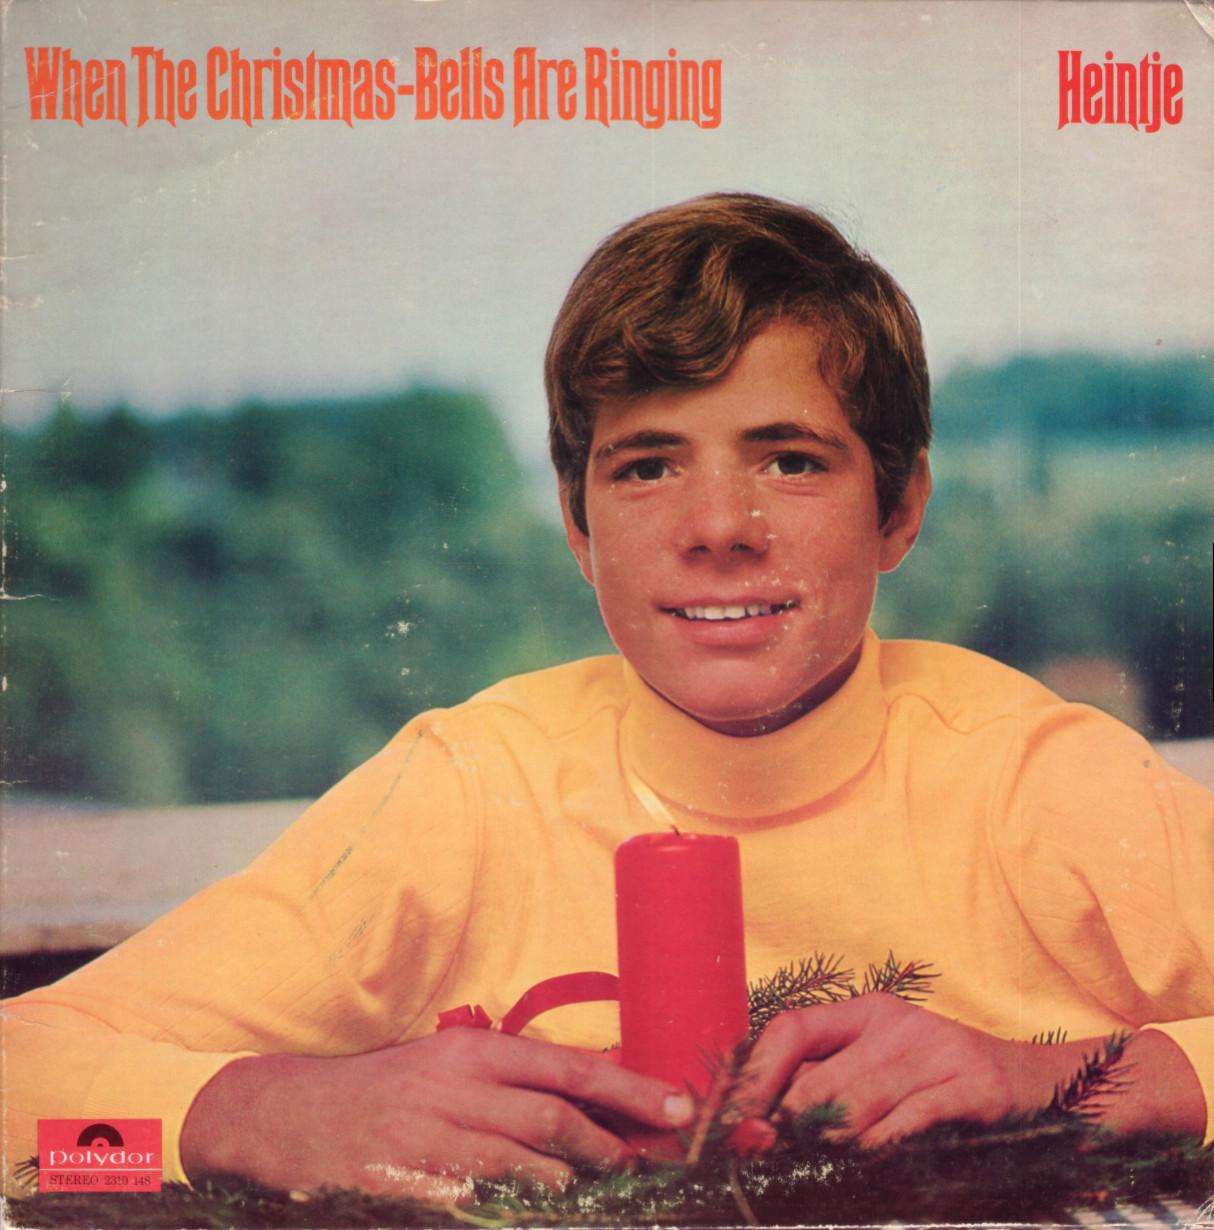 Bandas em Destaque: Heintje When The Christmas Bells Are Ringing